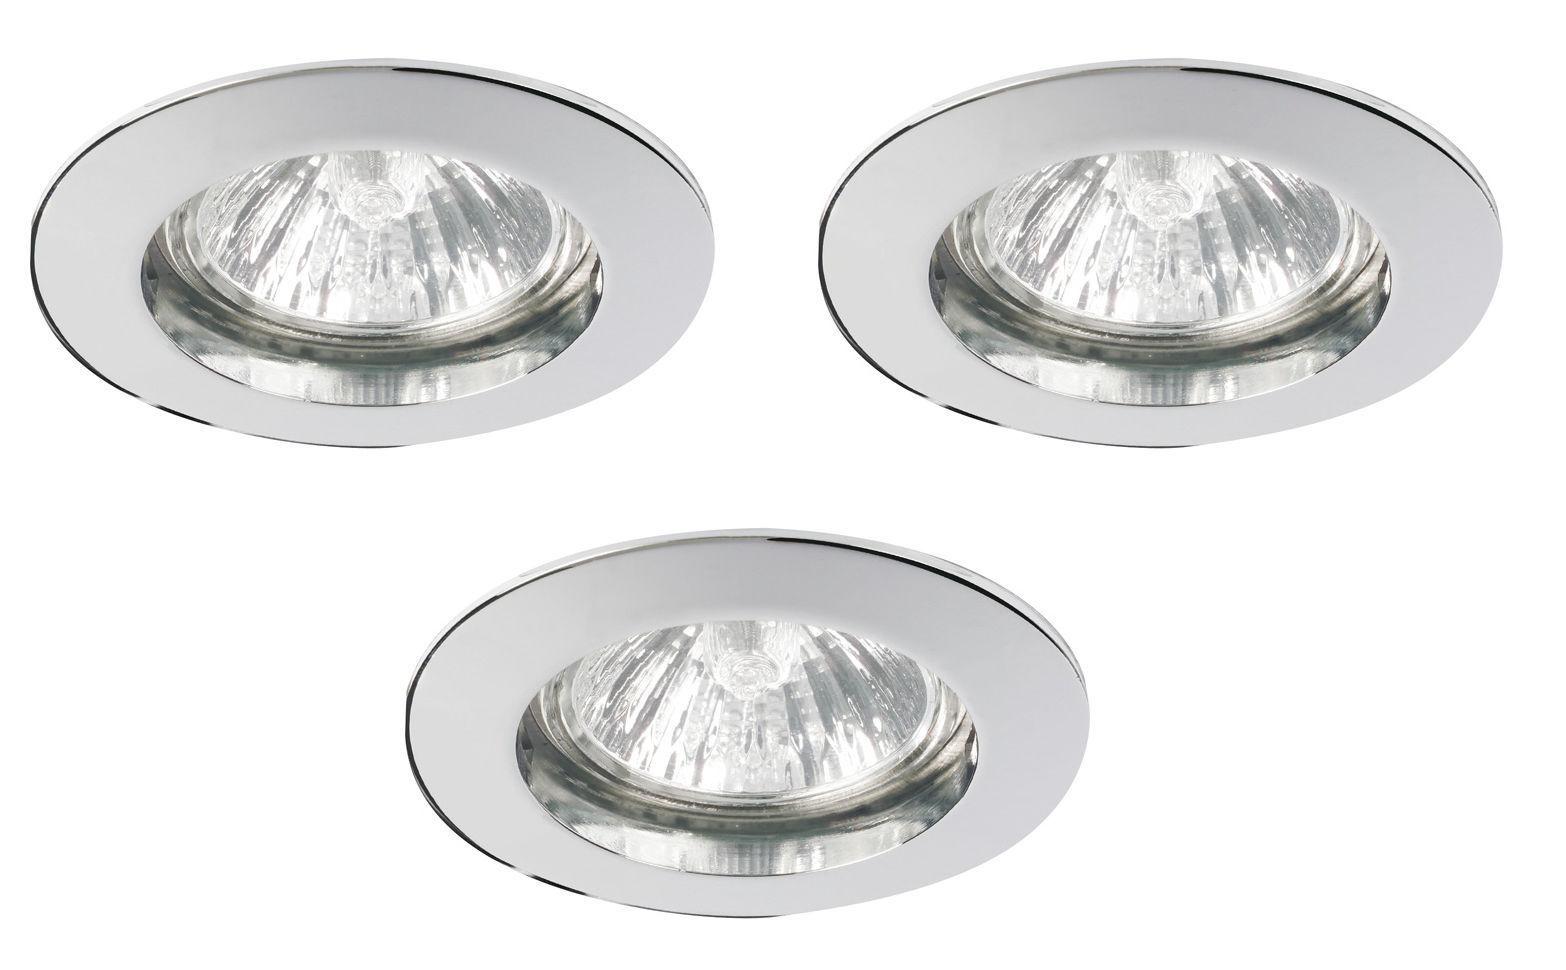 paulmann spot 3x35w crom ip44 hos lamper. Black Bedroom Furniture Sets. Home Design Ideas